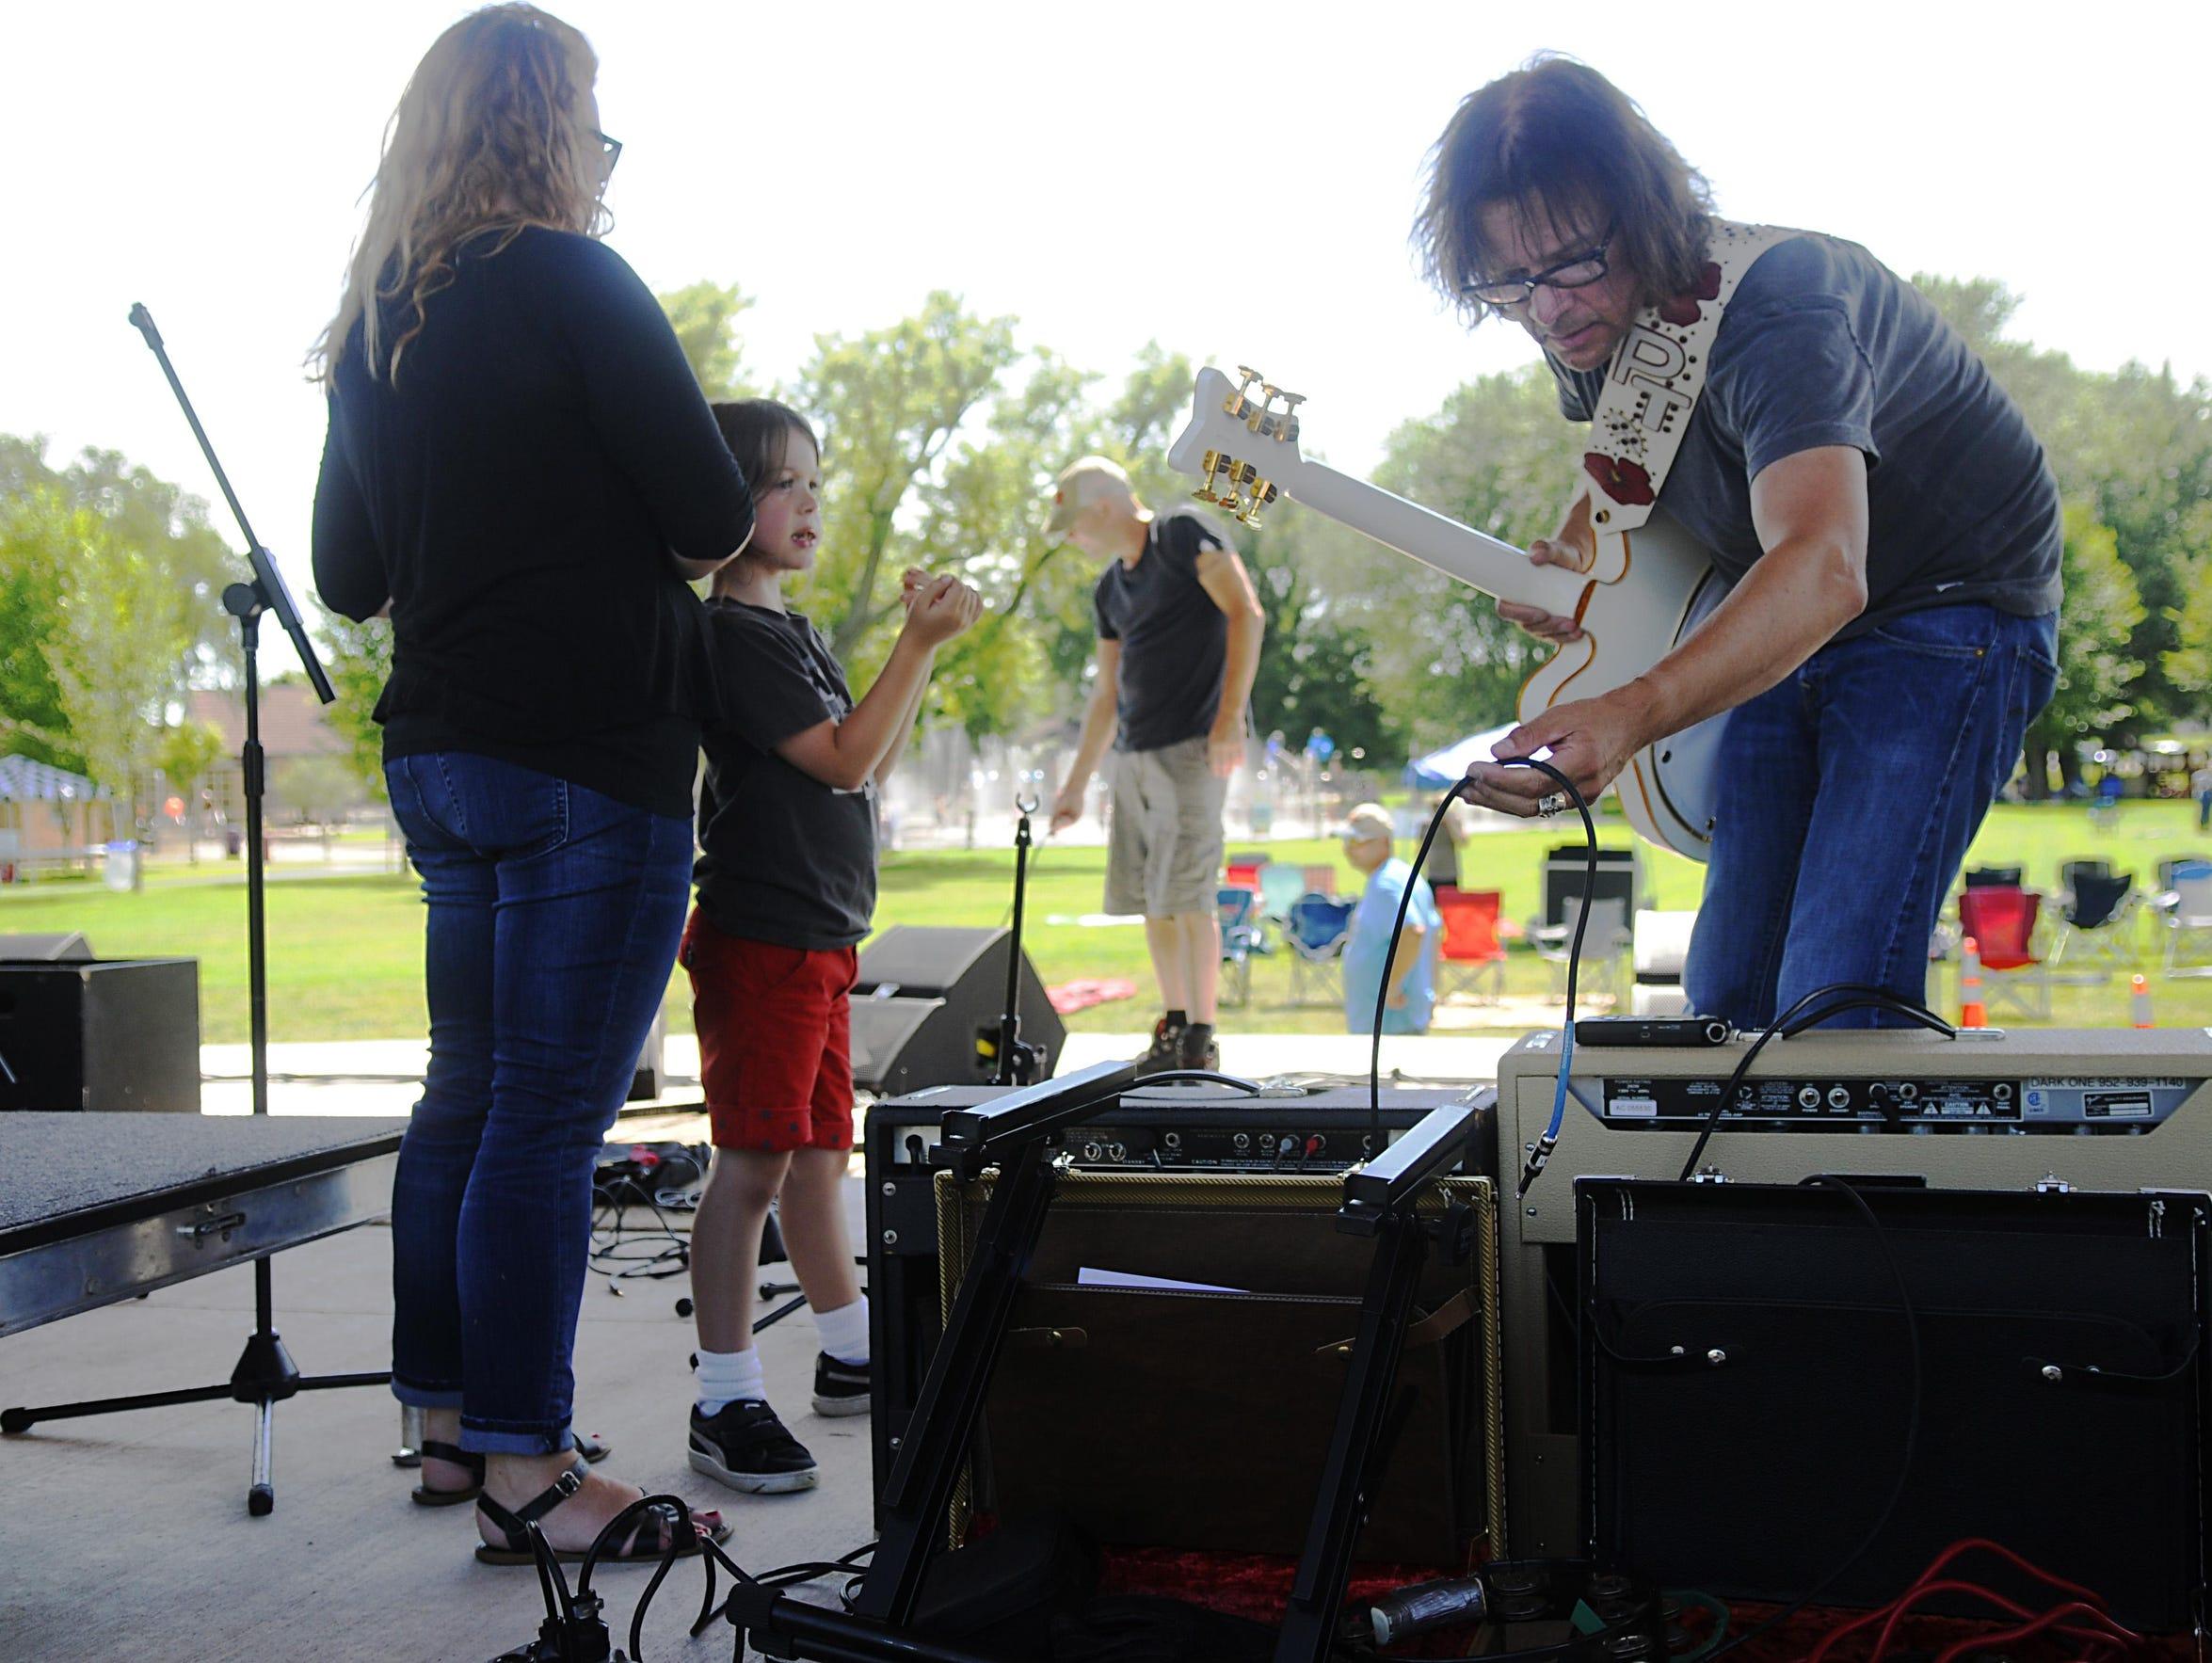 G.B. Leighton lead guitarist Patrik Tanner sets up